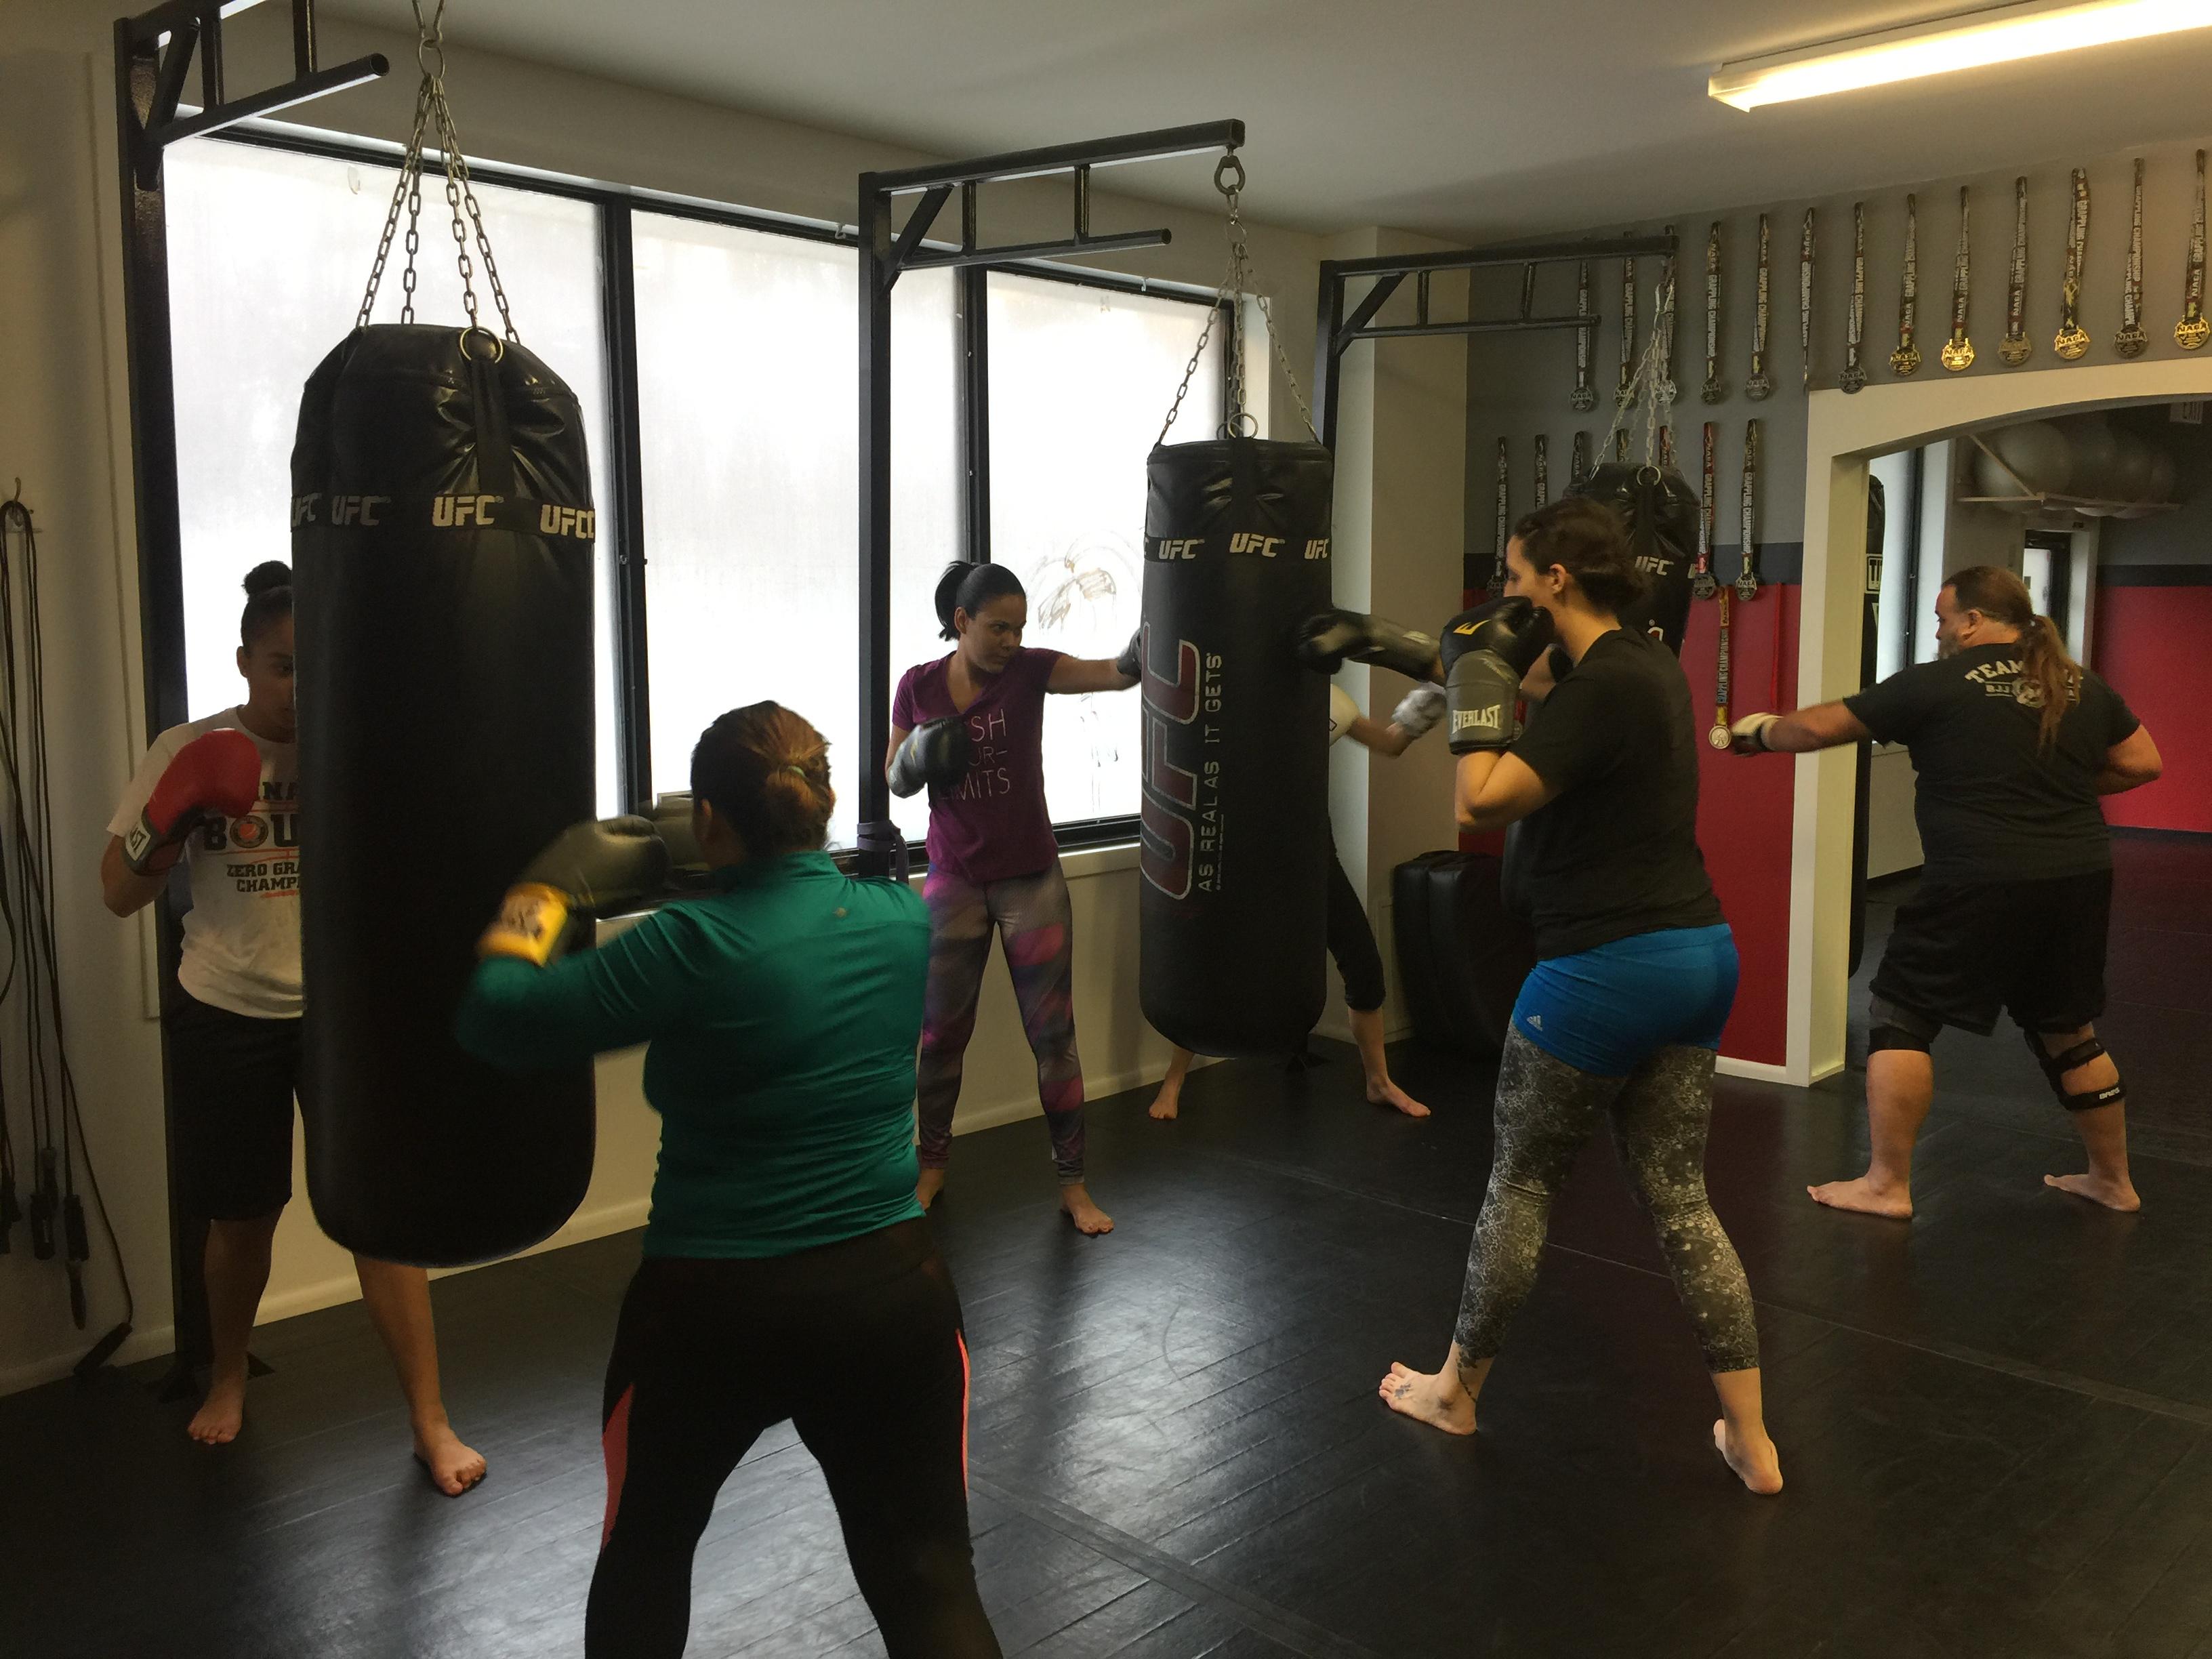 Northampton,Easthampton,Hadley,Amherst - Brazilain Jiu Jitsu